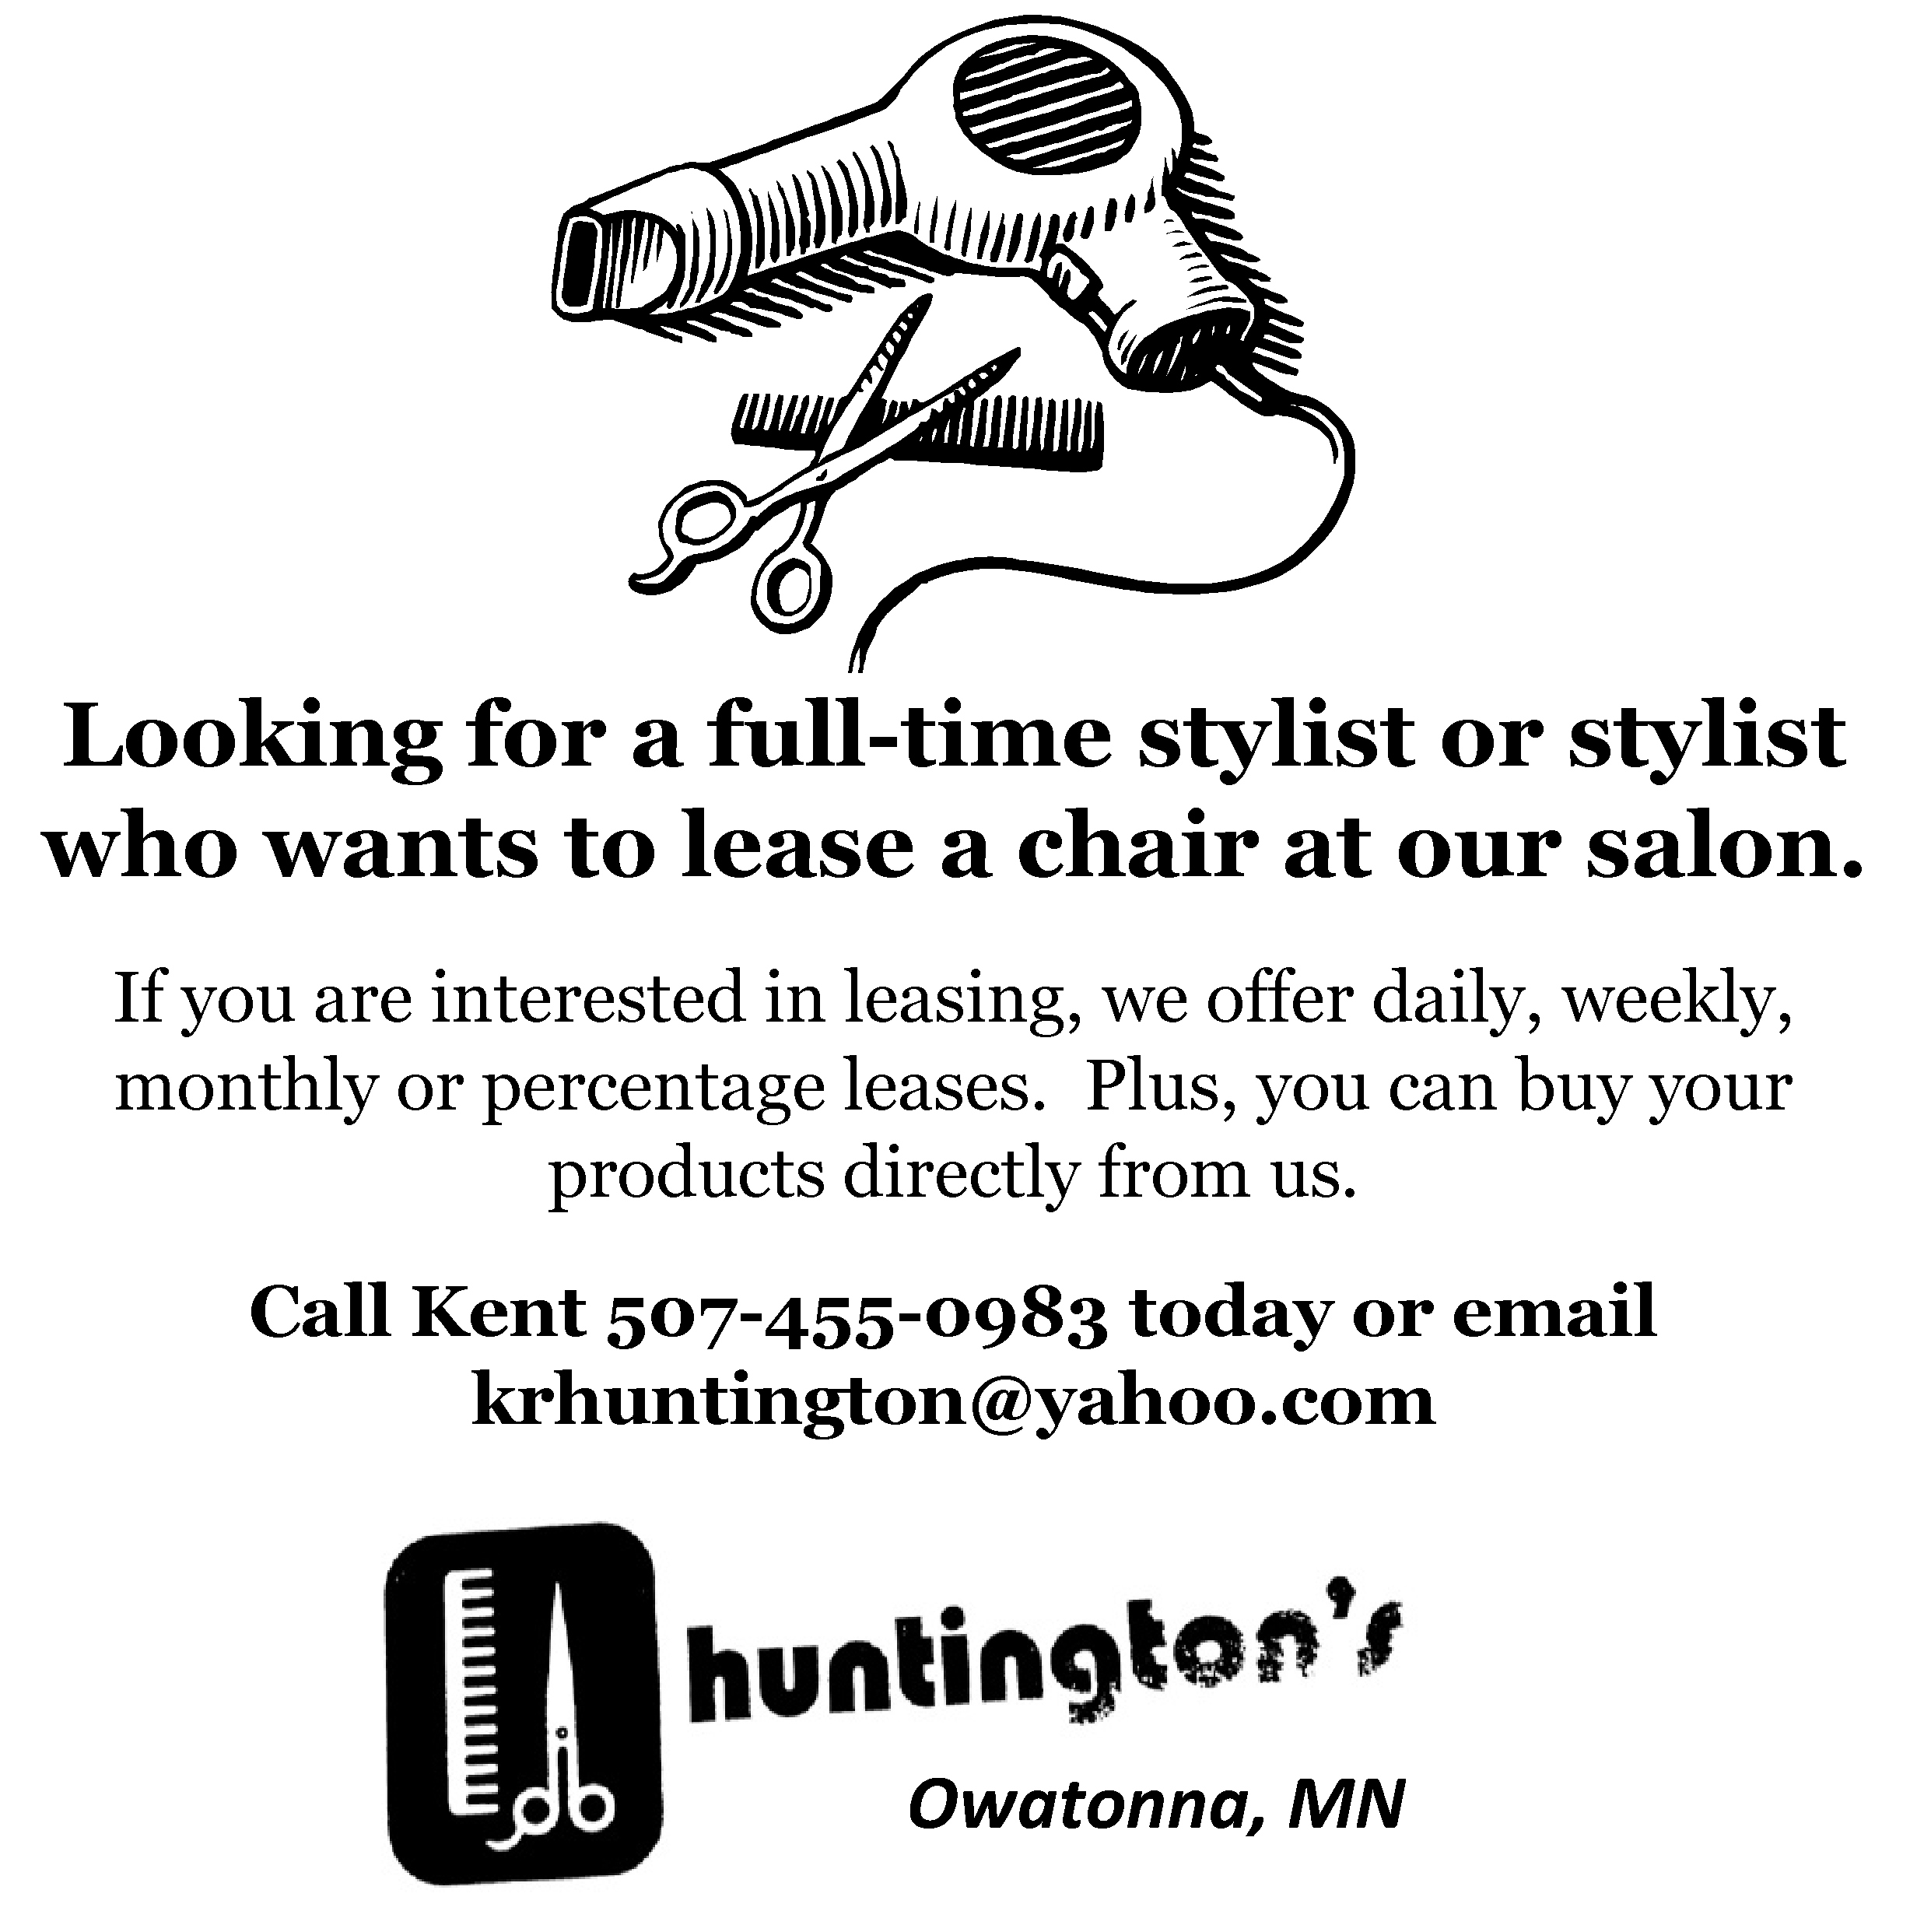 Huntingtons ad